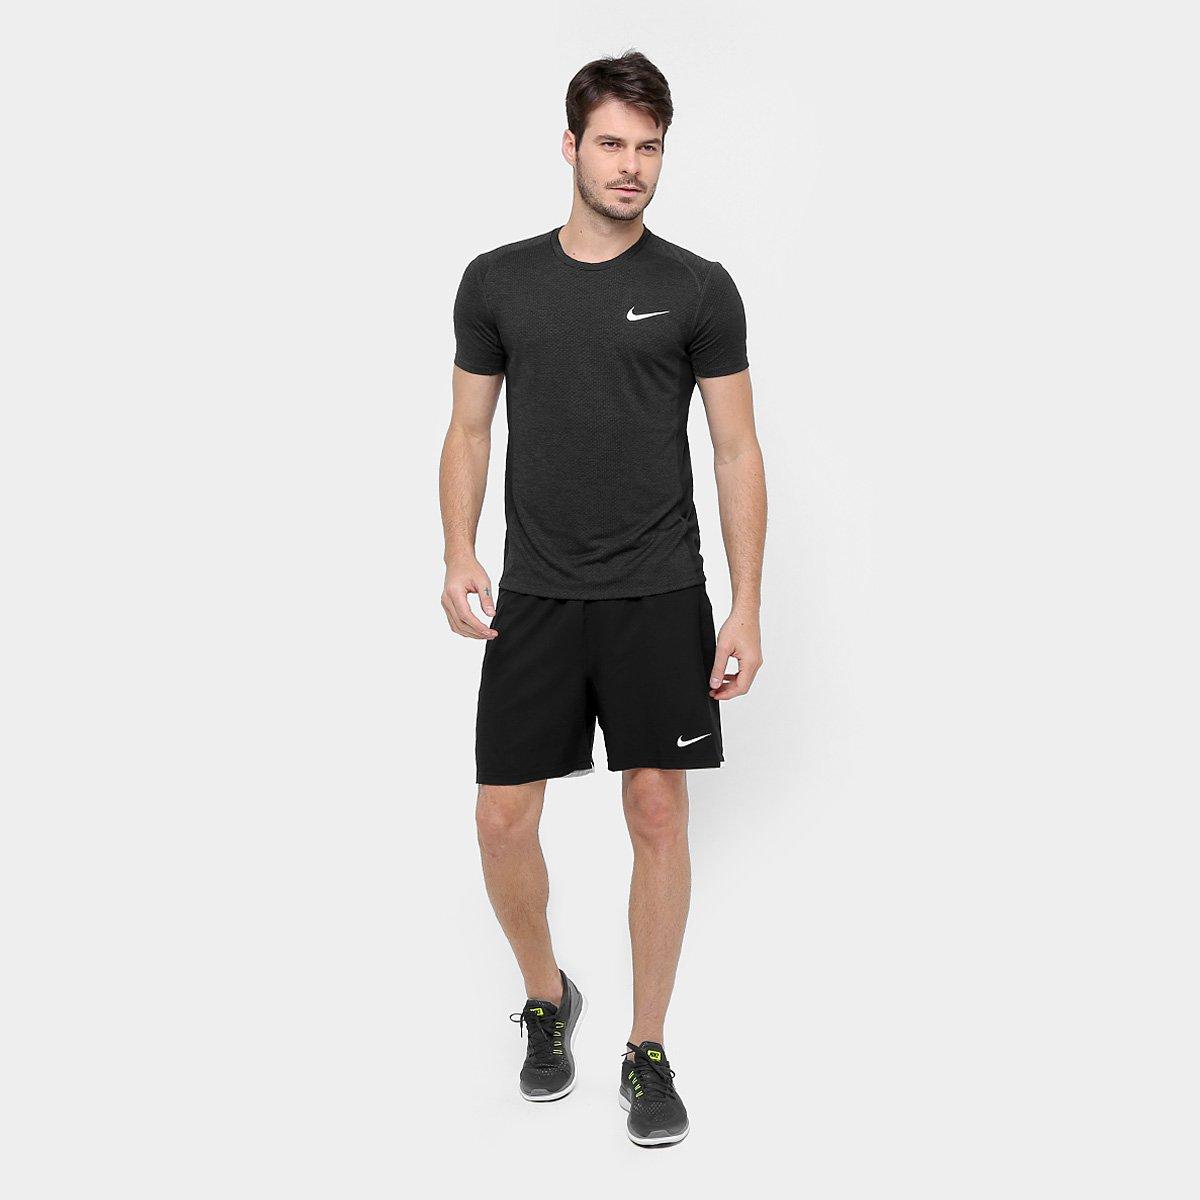 Camiseta Nike Dry Miler Cool Dri-Fit Masculina - Compre Agora  bdf73358e8c41